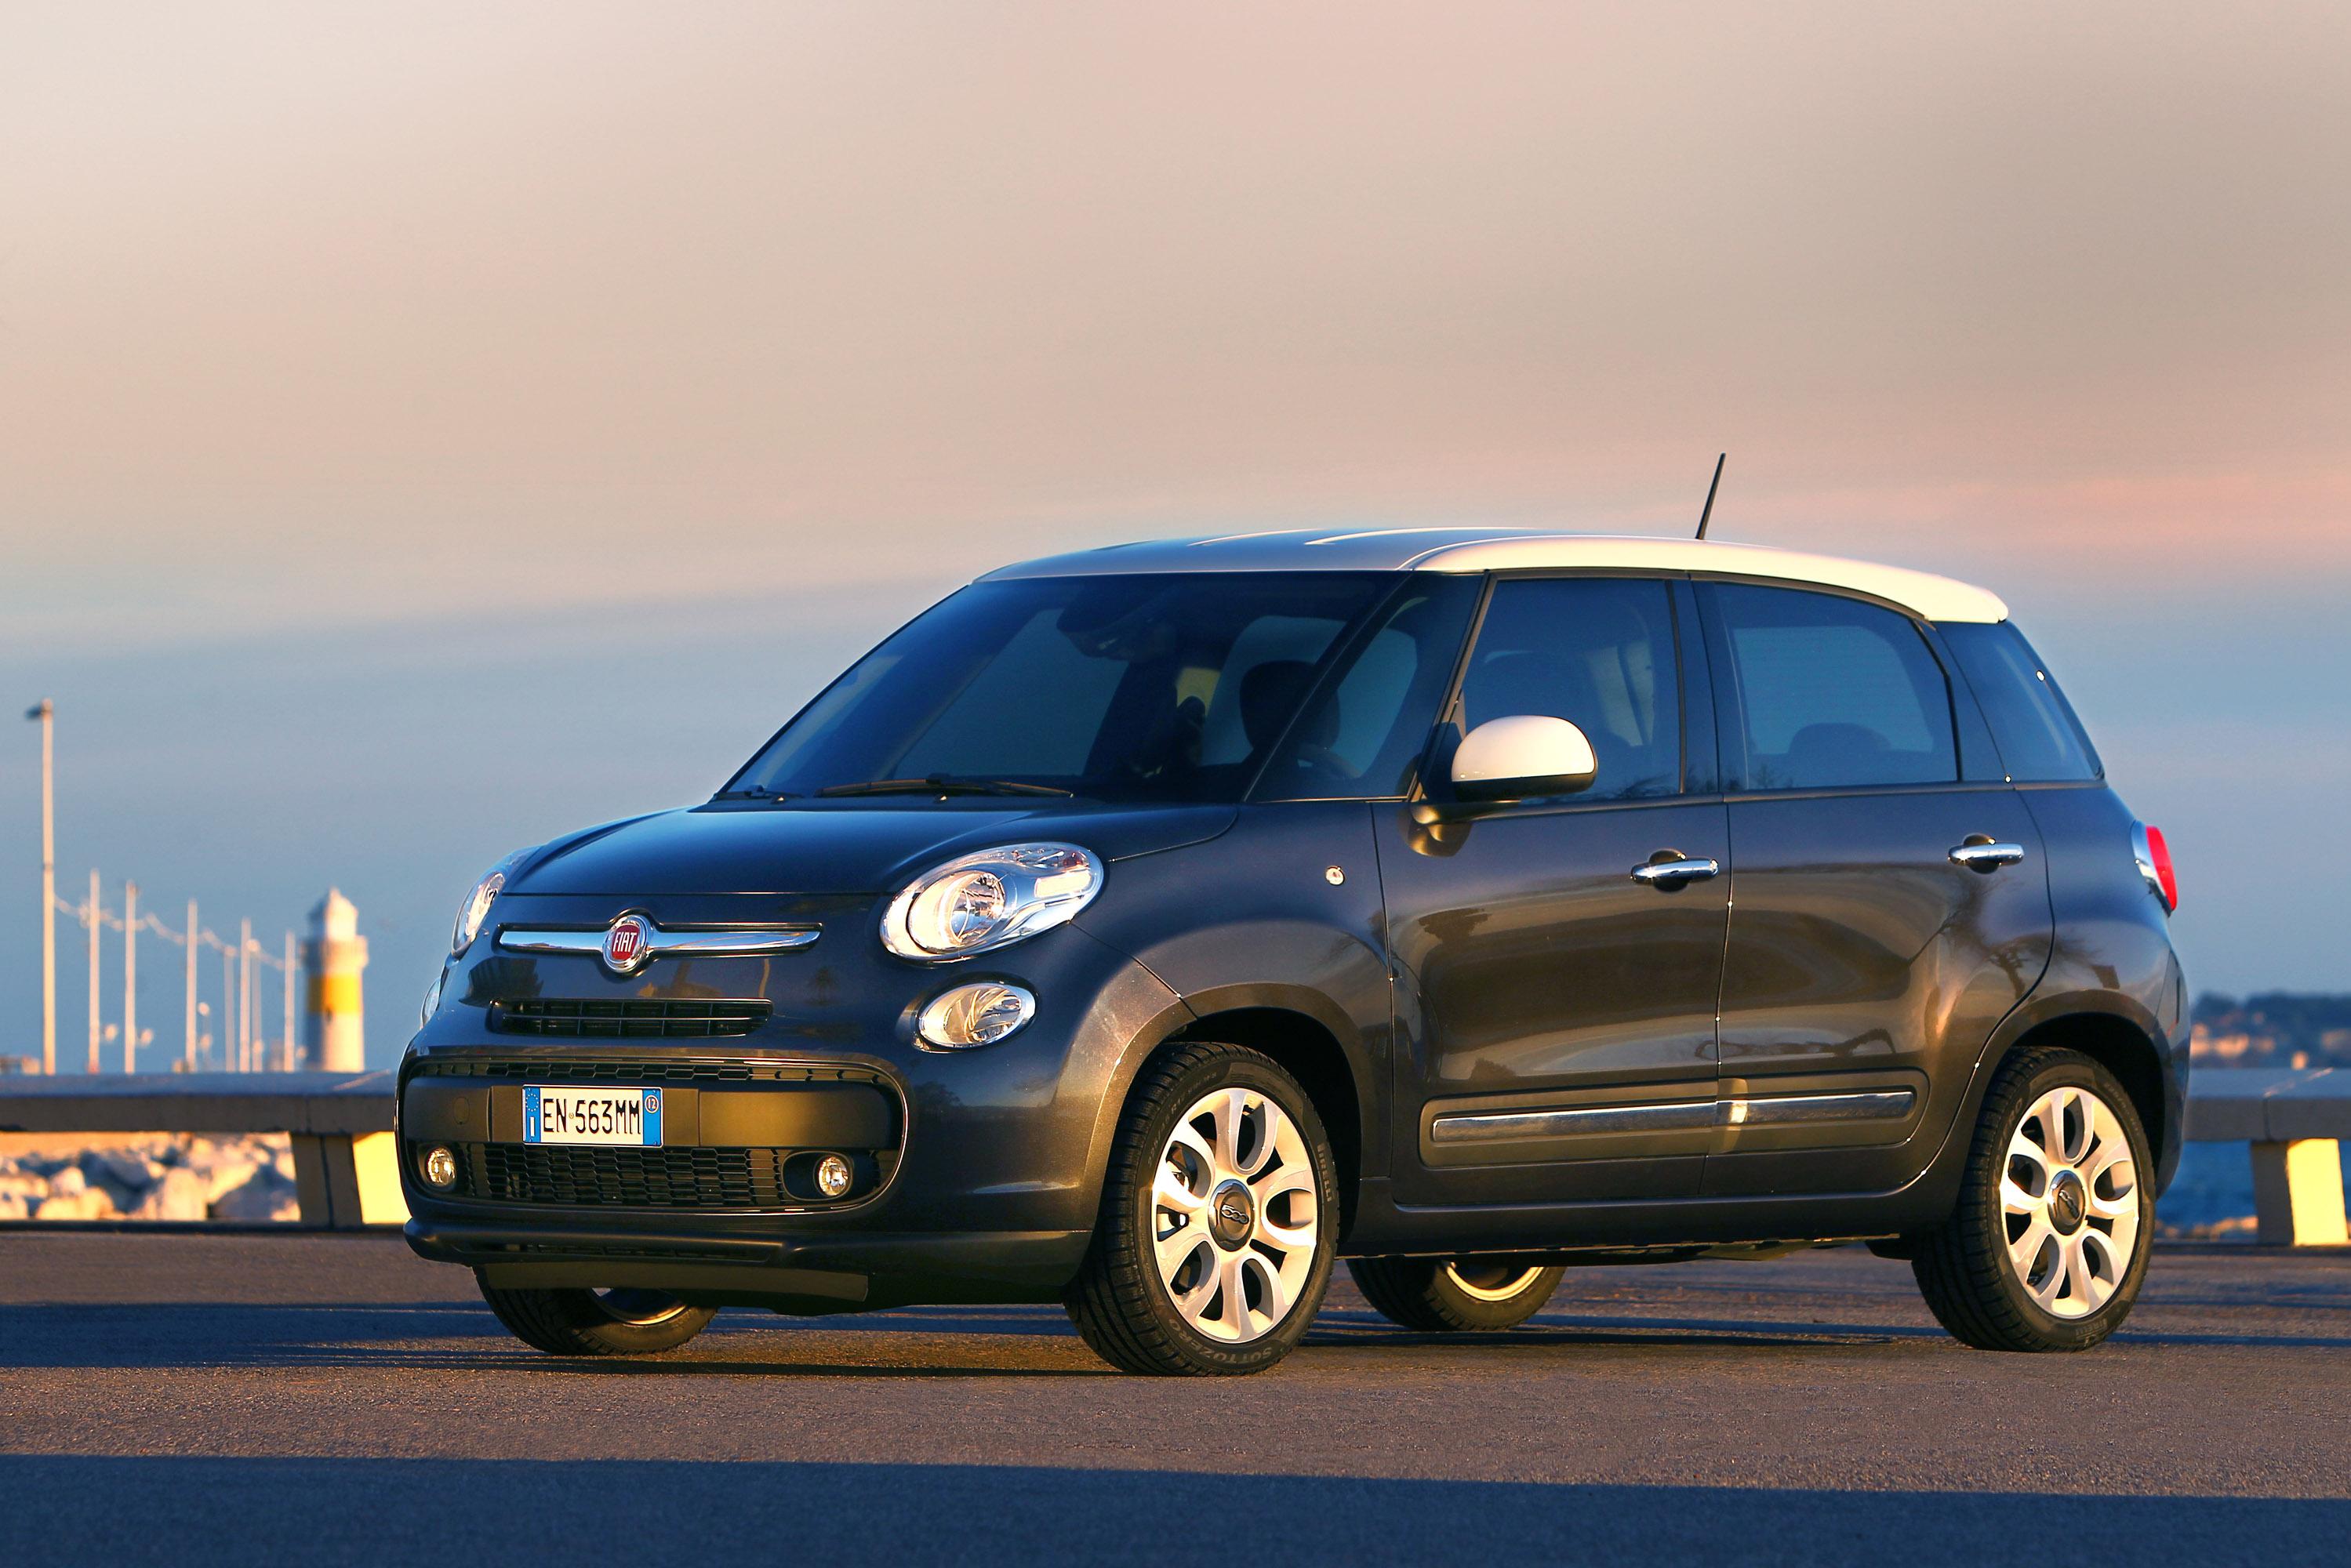 2013 Fiat 500l Picture 81434